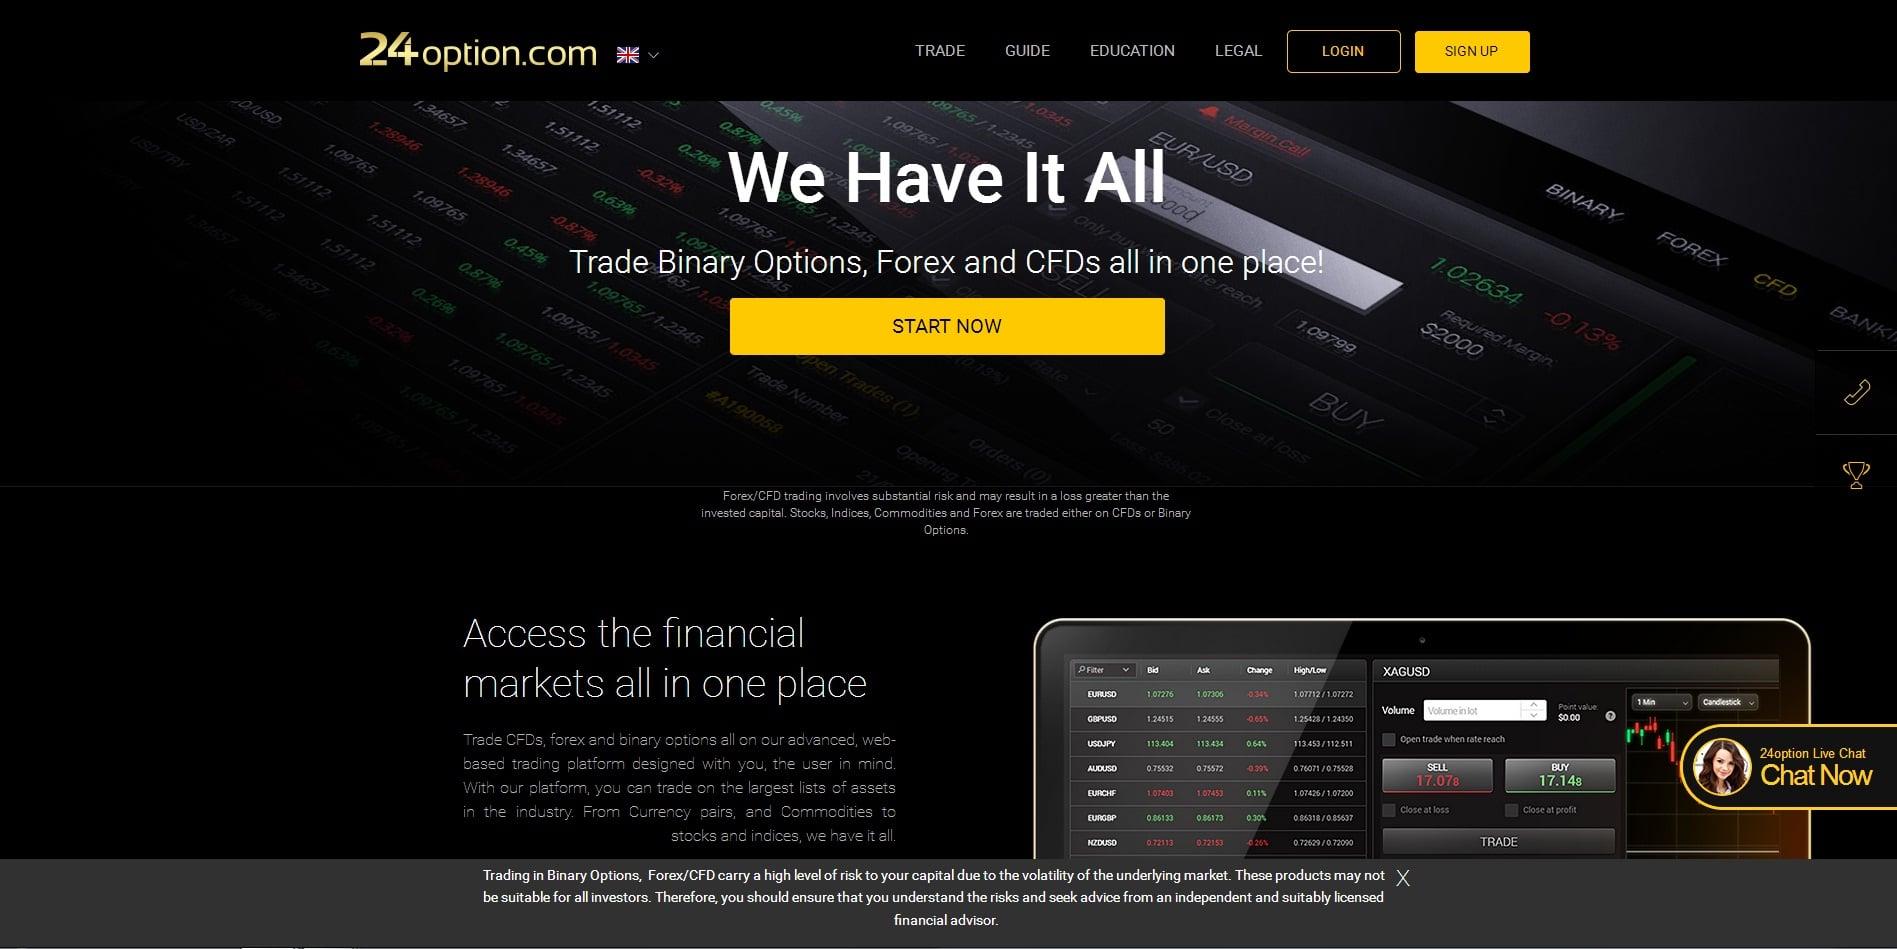 24Option Home Page Screenshot